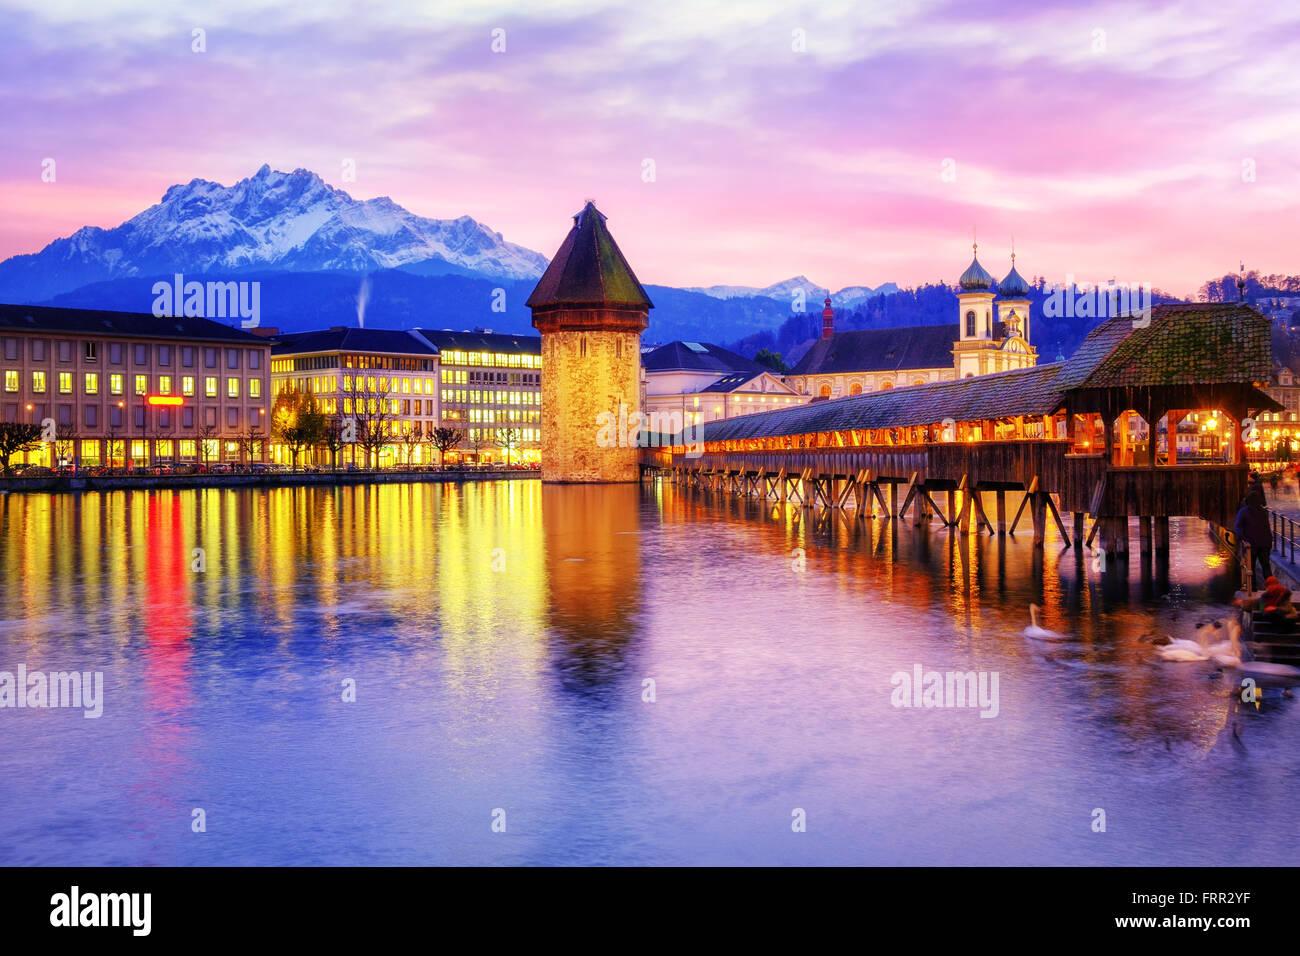 Chapel bridge, Water tower and Mount Pilatus on sunset, Lucerne, Switzerland. - Stock Image